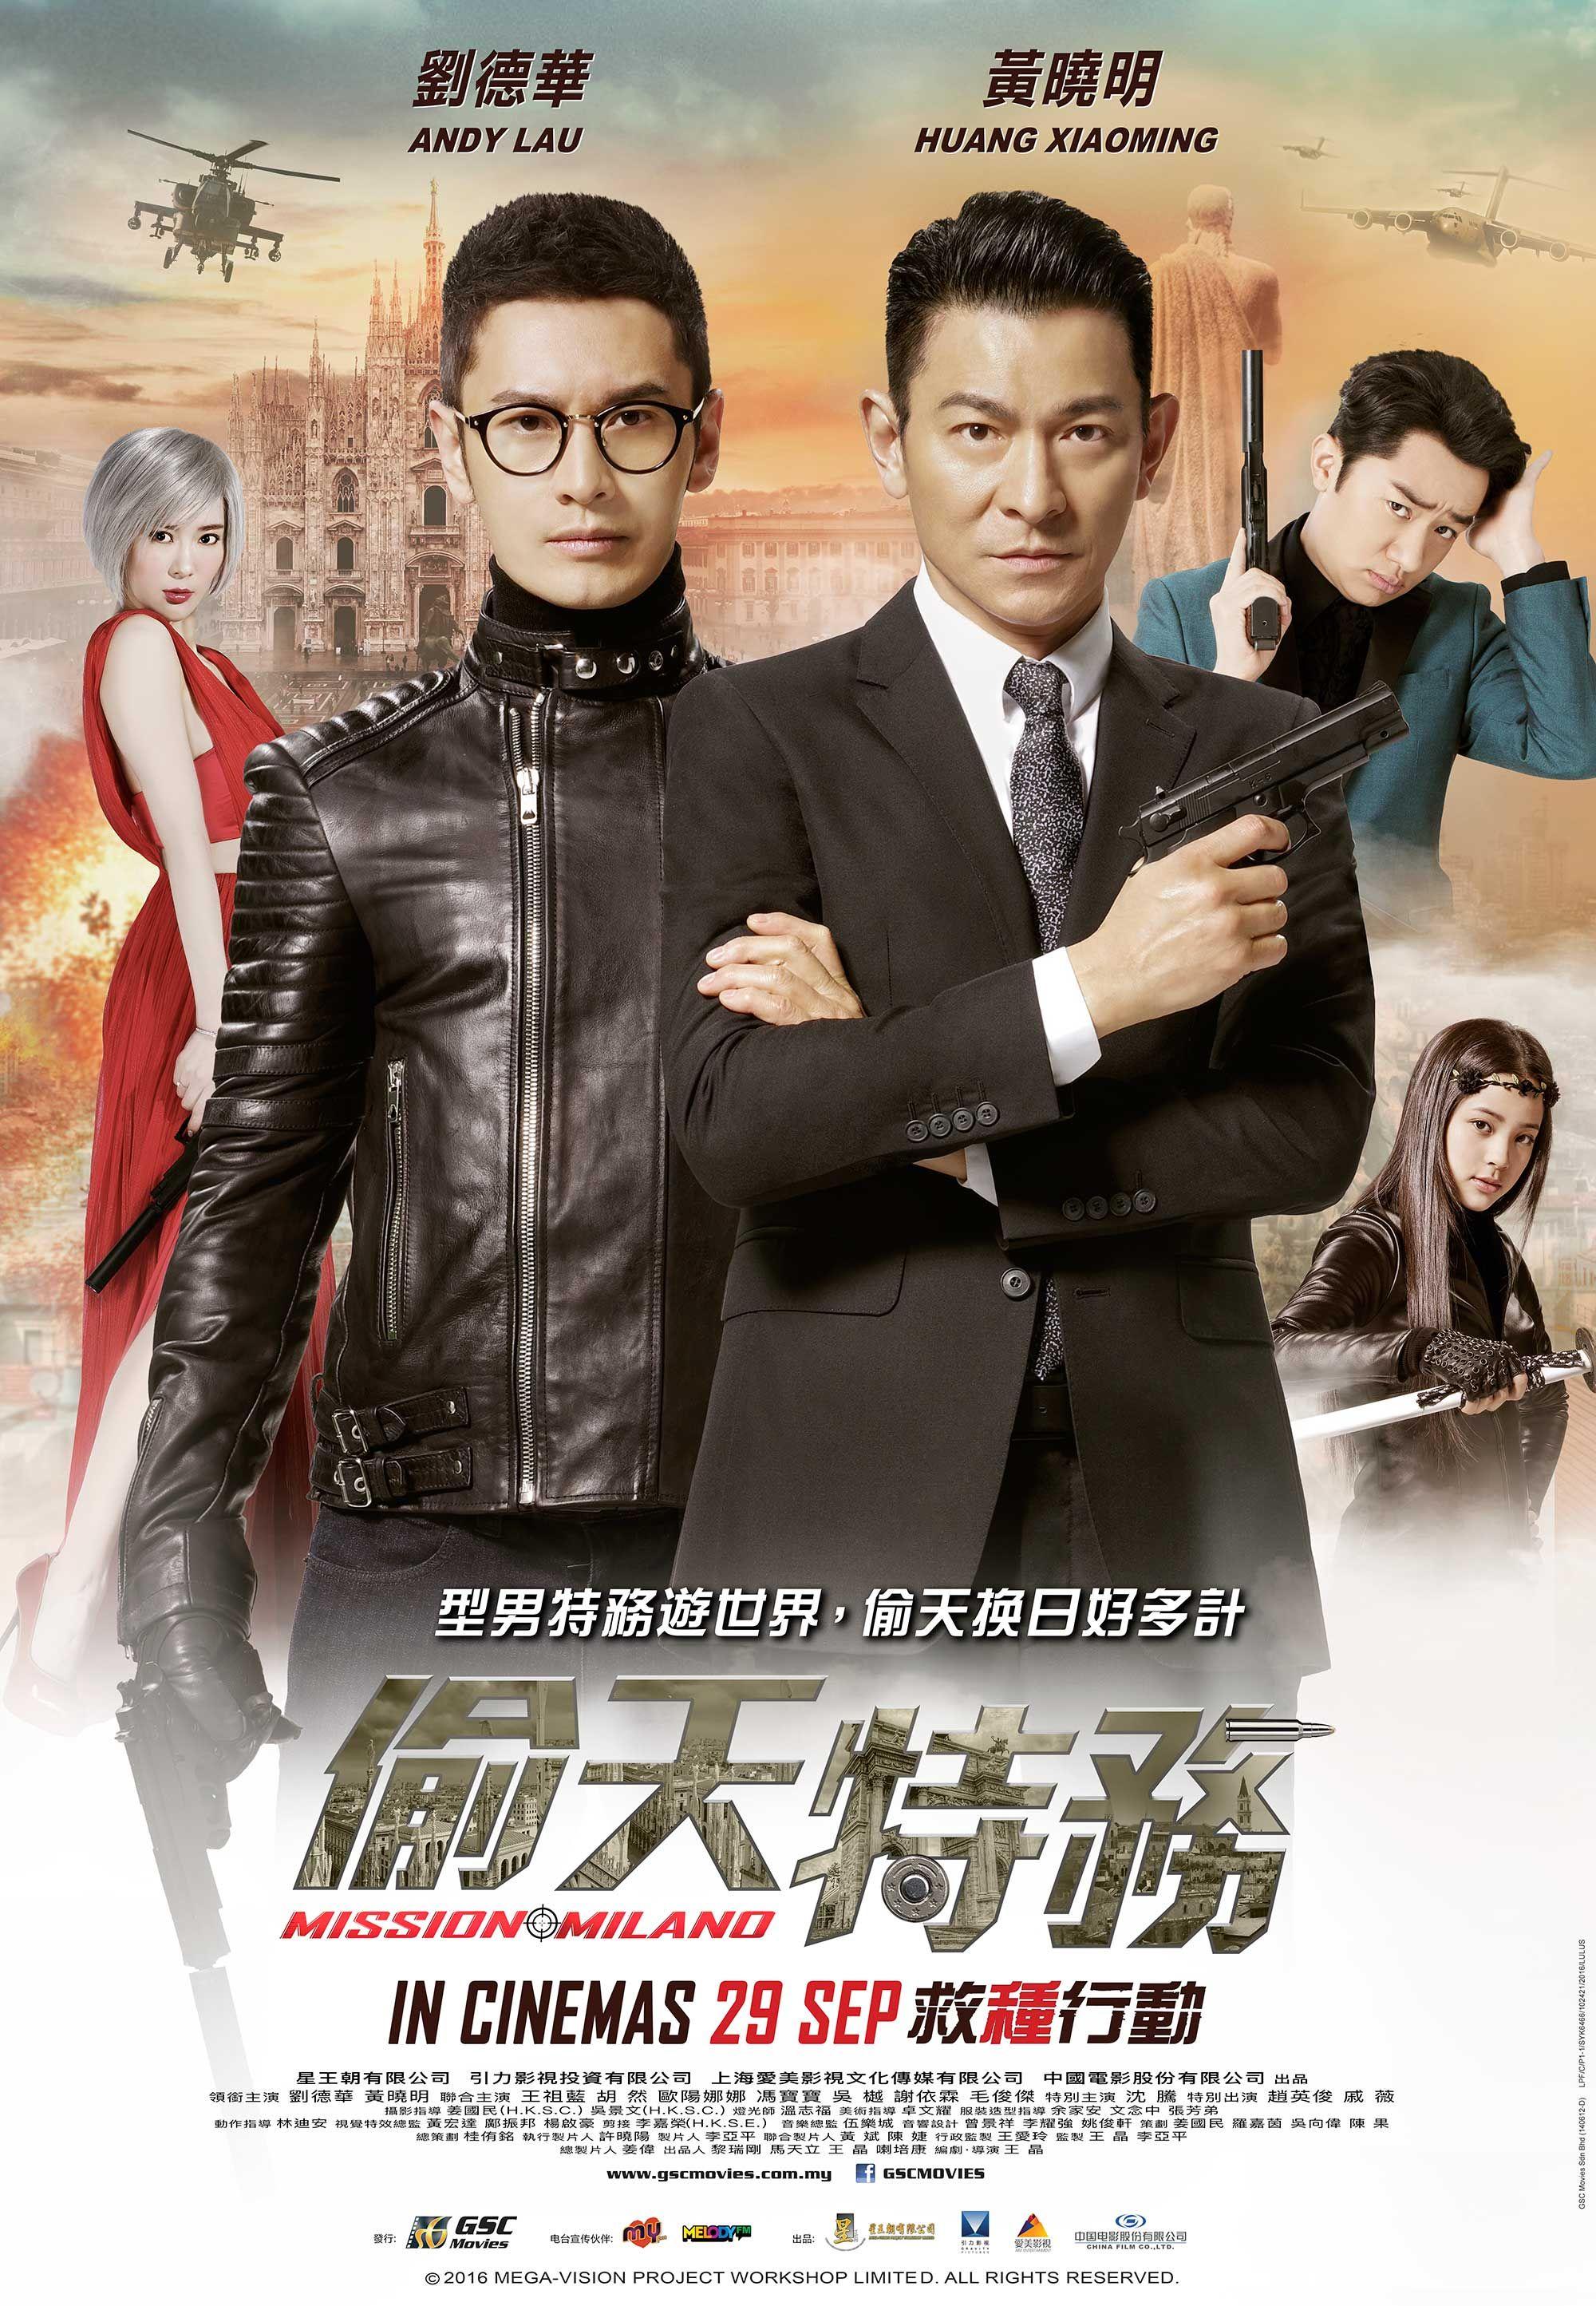 Mission Milano 偷天特務 2016 Film China Mission Movies